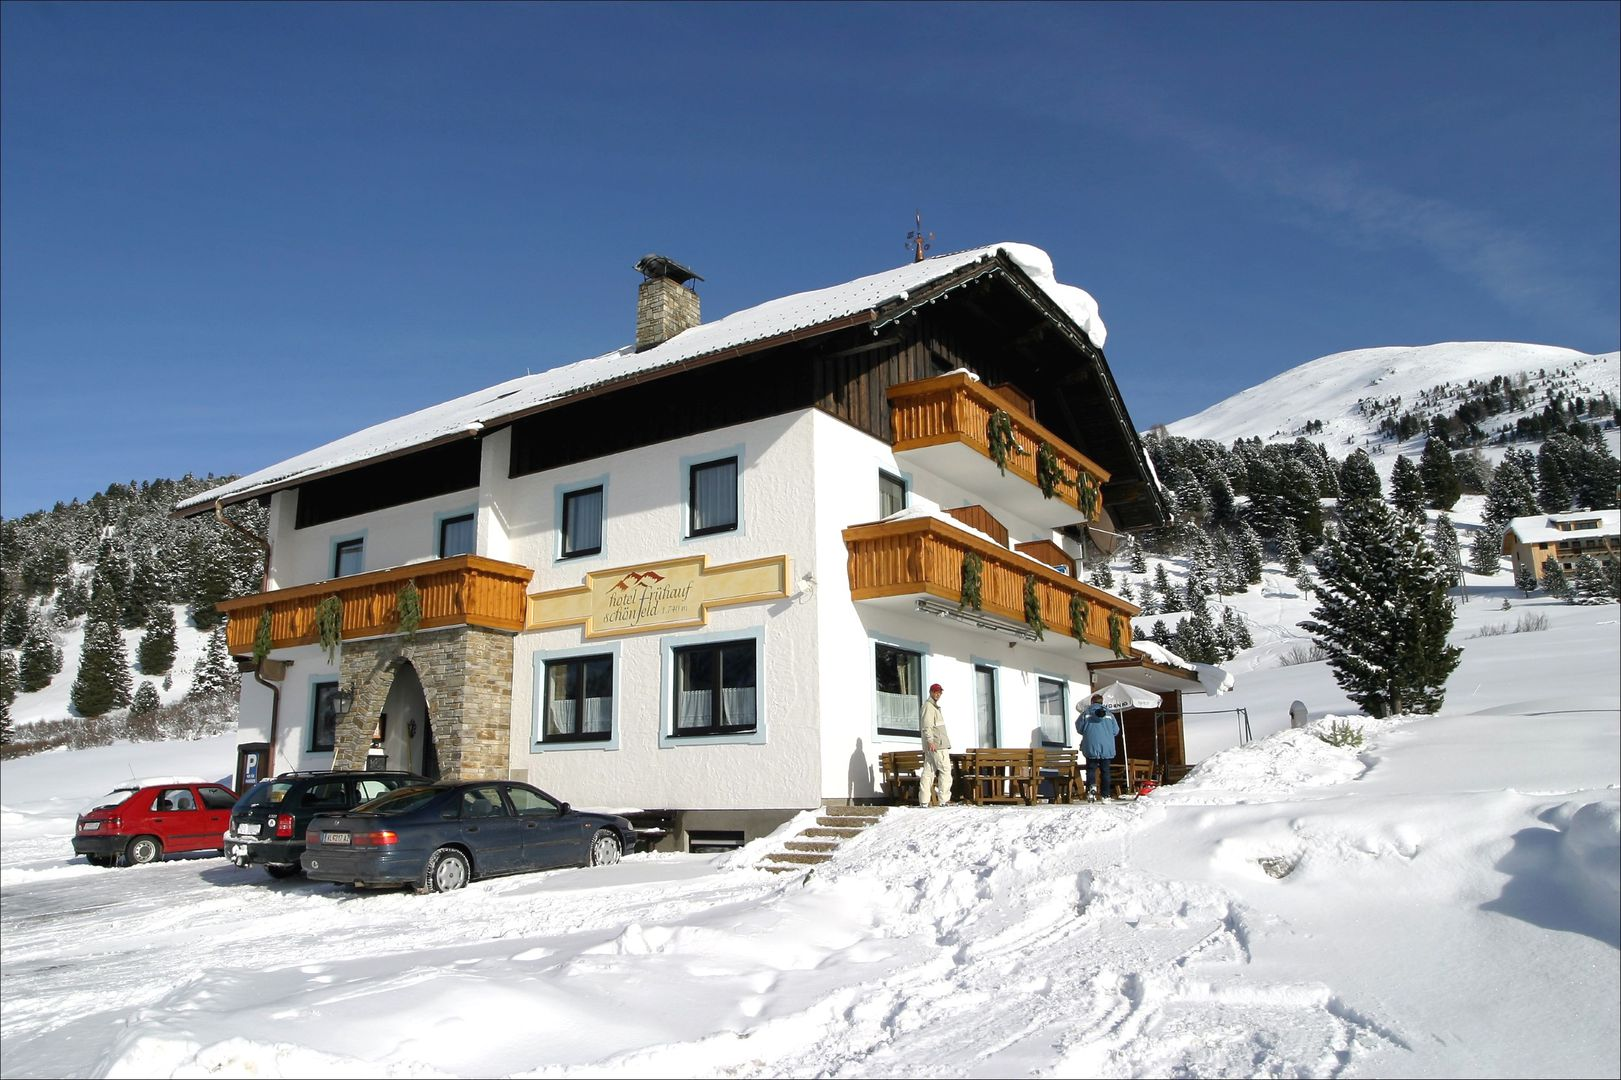 Appartement de vacances 6-Pers.-Appartement (Mattehansnock, ca. 57 m²), OV, Ferienwohnungen Almsonne (2470610), Karneralm, Lungau, Salzbourg, Autriche, image 1